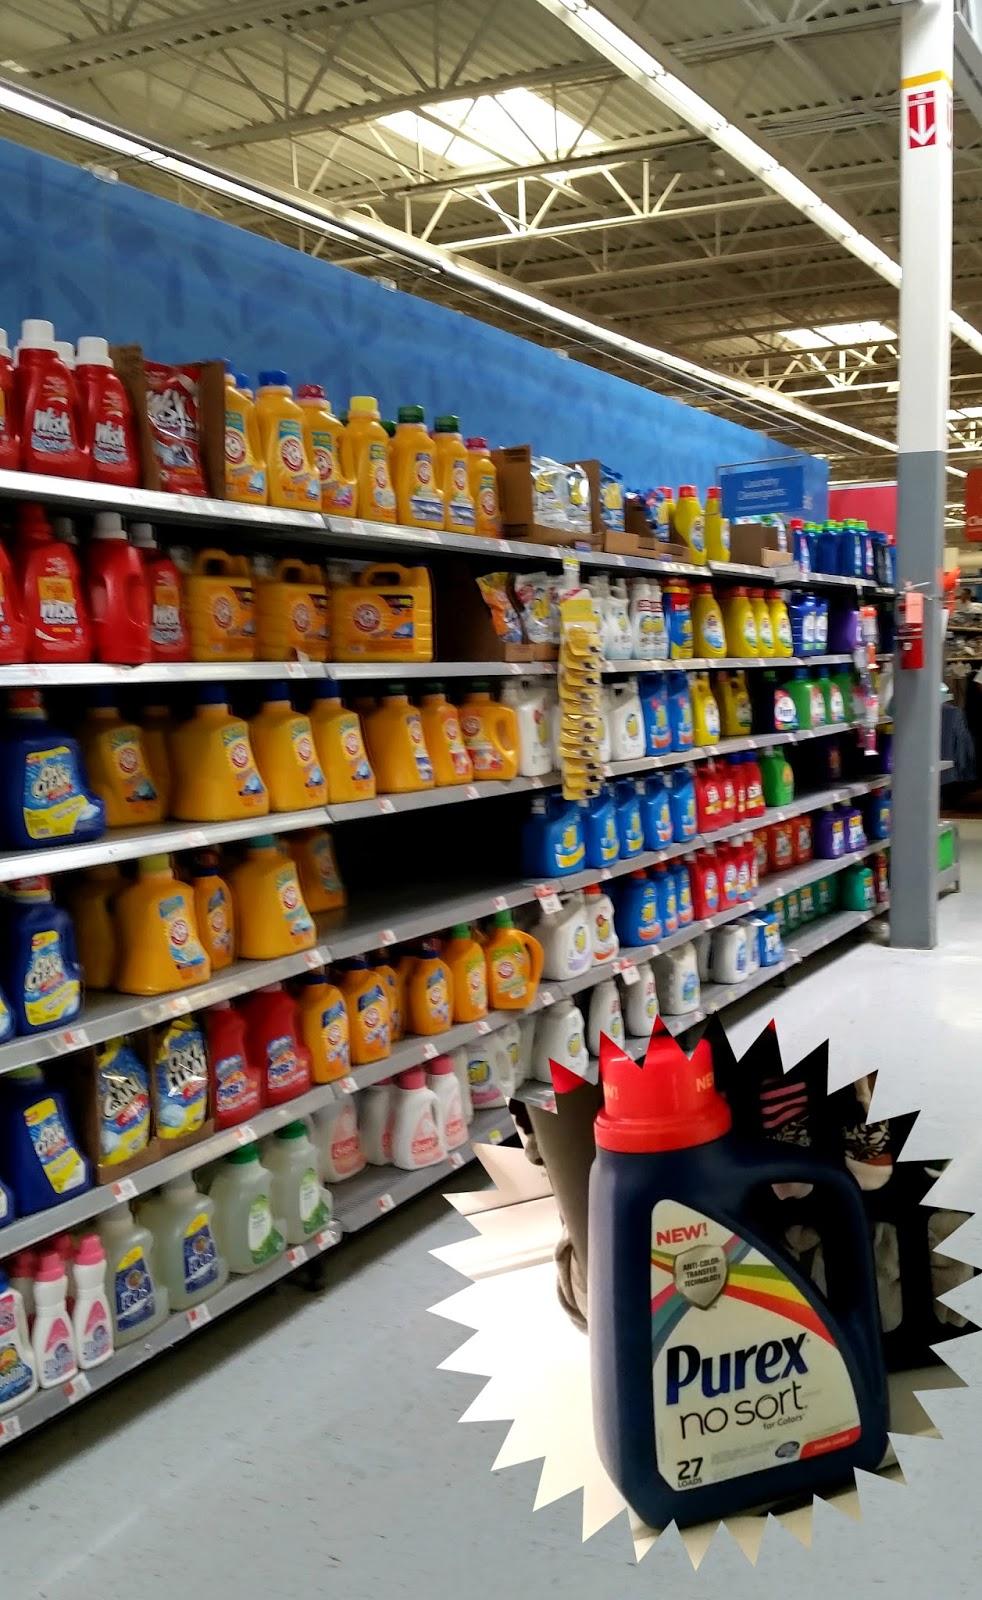 Purex-No-Sort-at-Walmart-#LaundrySimplified-#shop